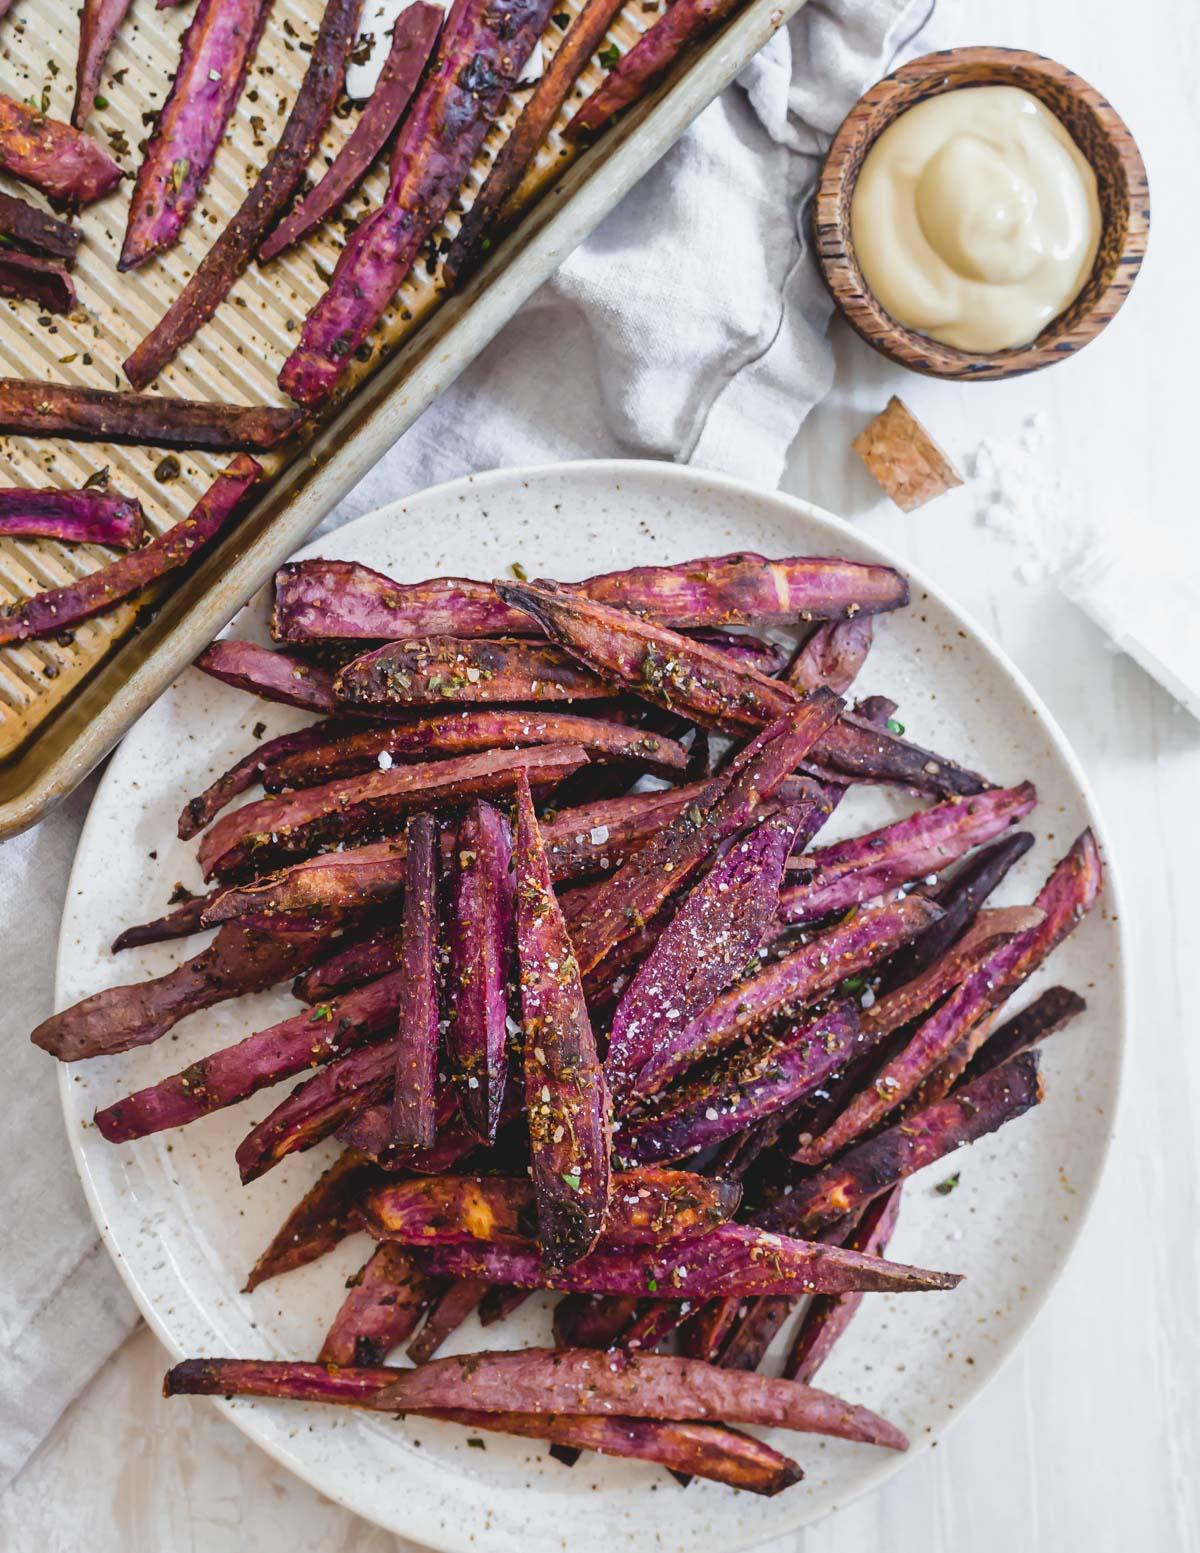 Crispy purple sweet potato fries with herbs and sea salt on a plate.